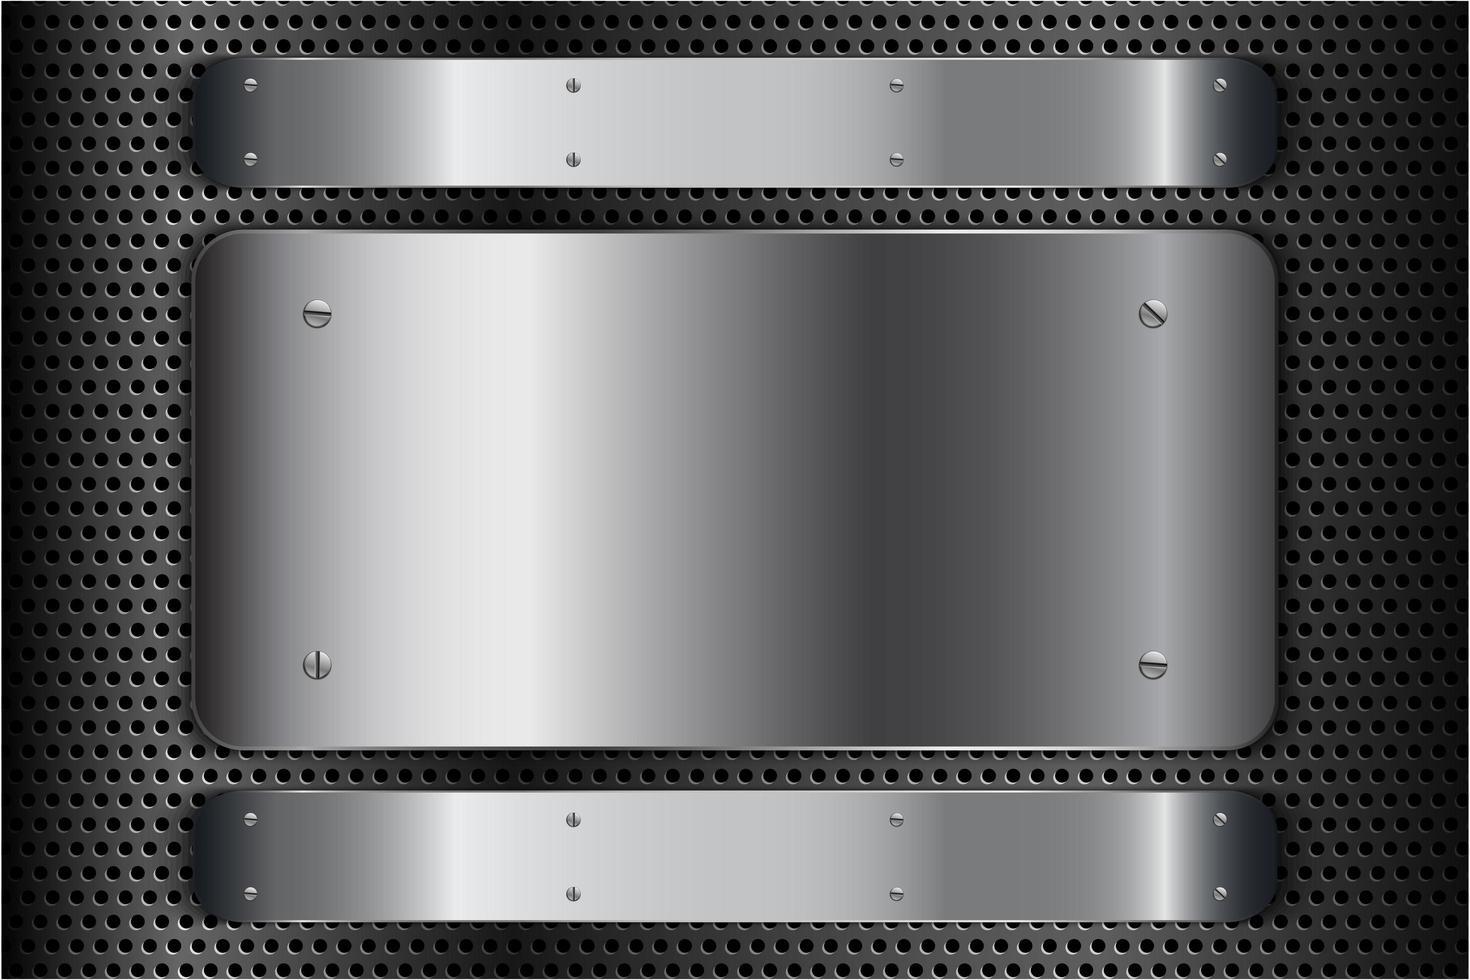 moderne zilver metallic achtergrond vector